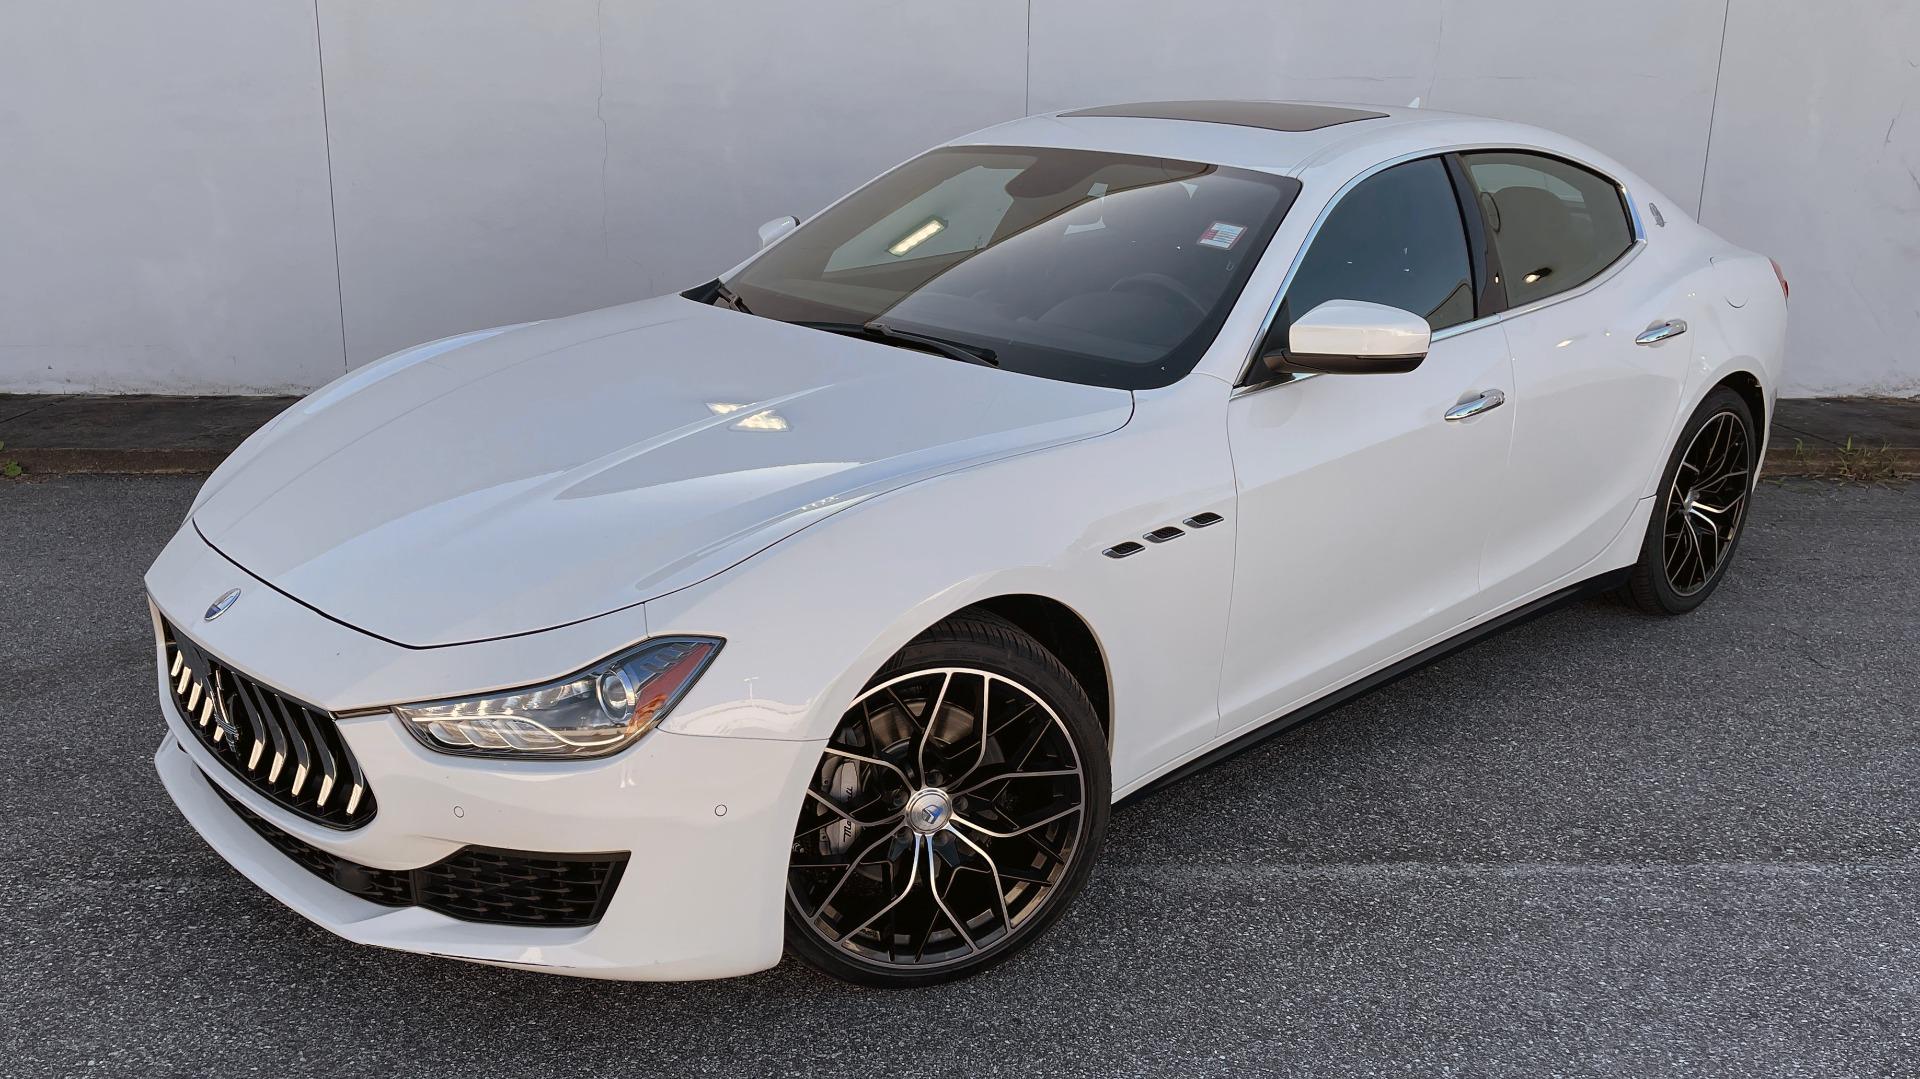 Used 2018 Maserati GHIBLI SEDAN / RWD / 3.0L V6 / SUNROOF / NAV / REARVIEW for sale $42,995 at Formula Imports in Charlotte NC 28227 3